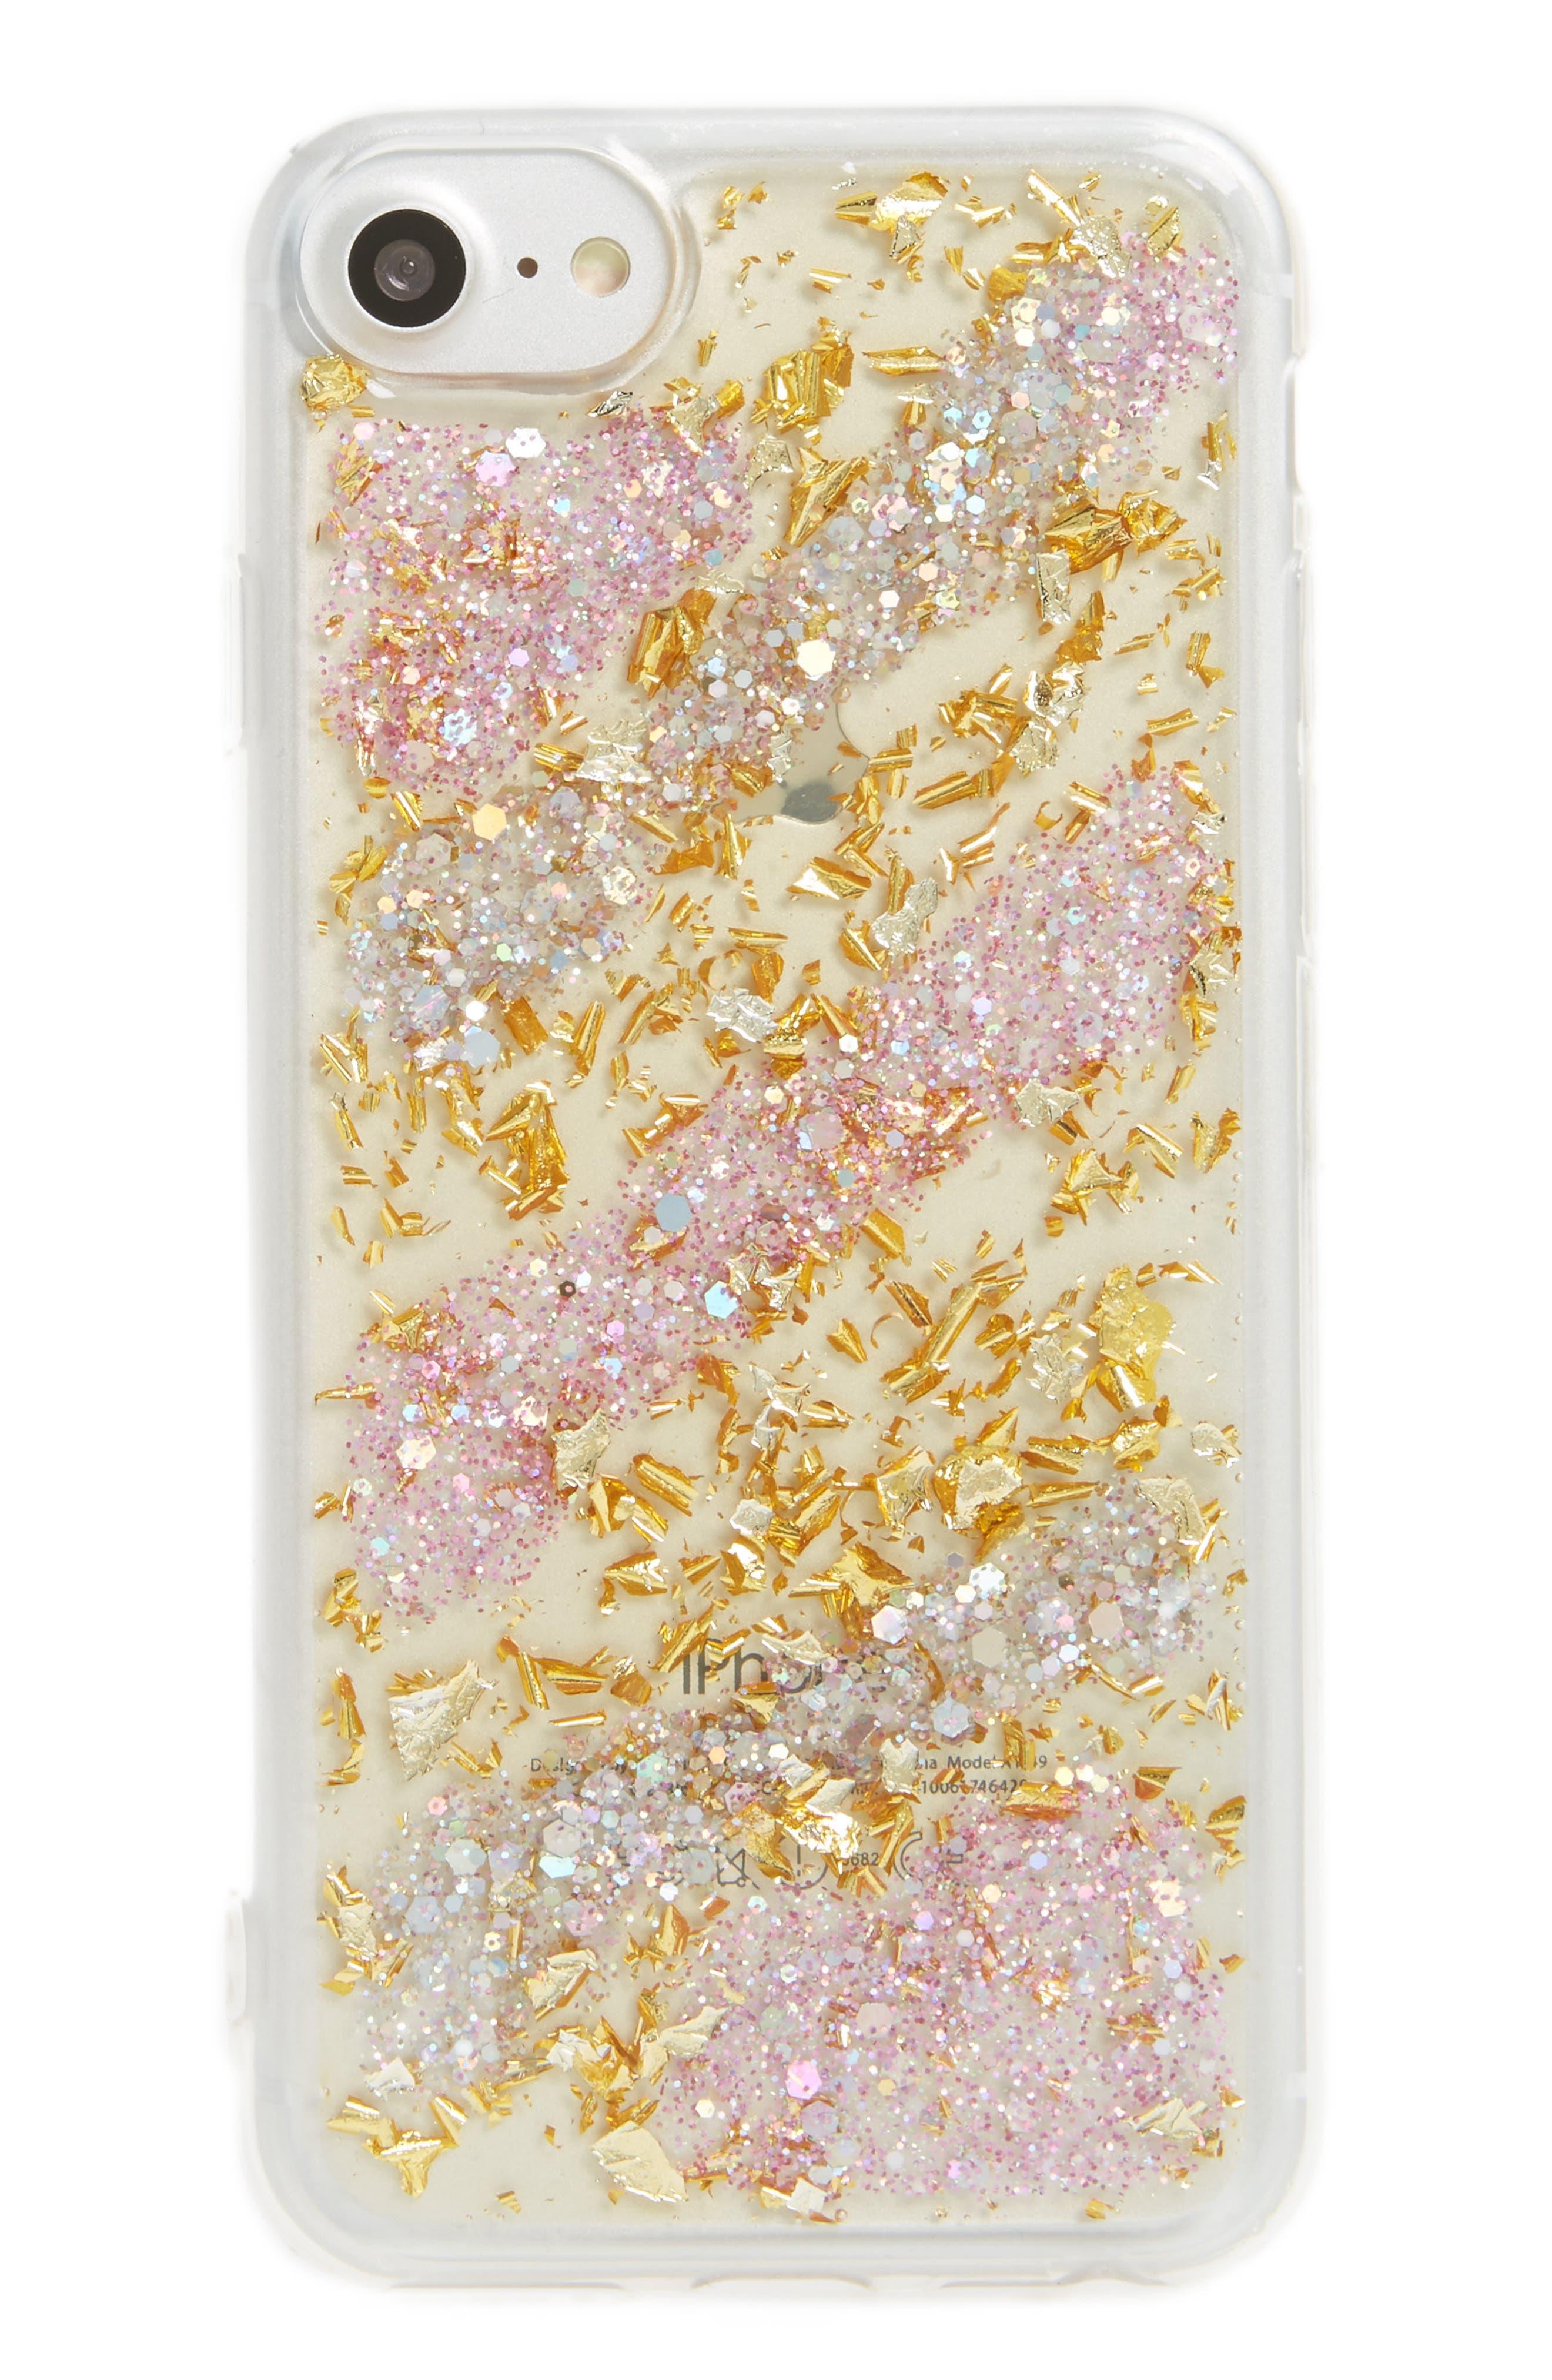 Alternate Image 1 Selected - OK originals Glitter Stripe iPhone 6/6s/7 Case